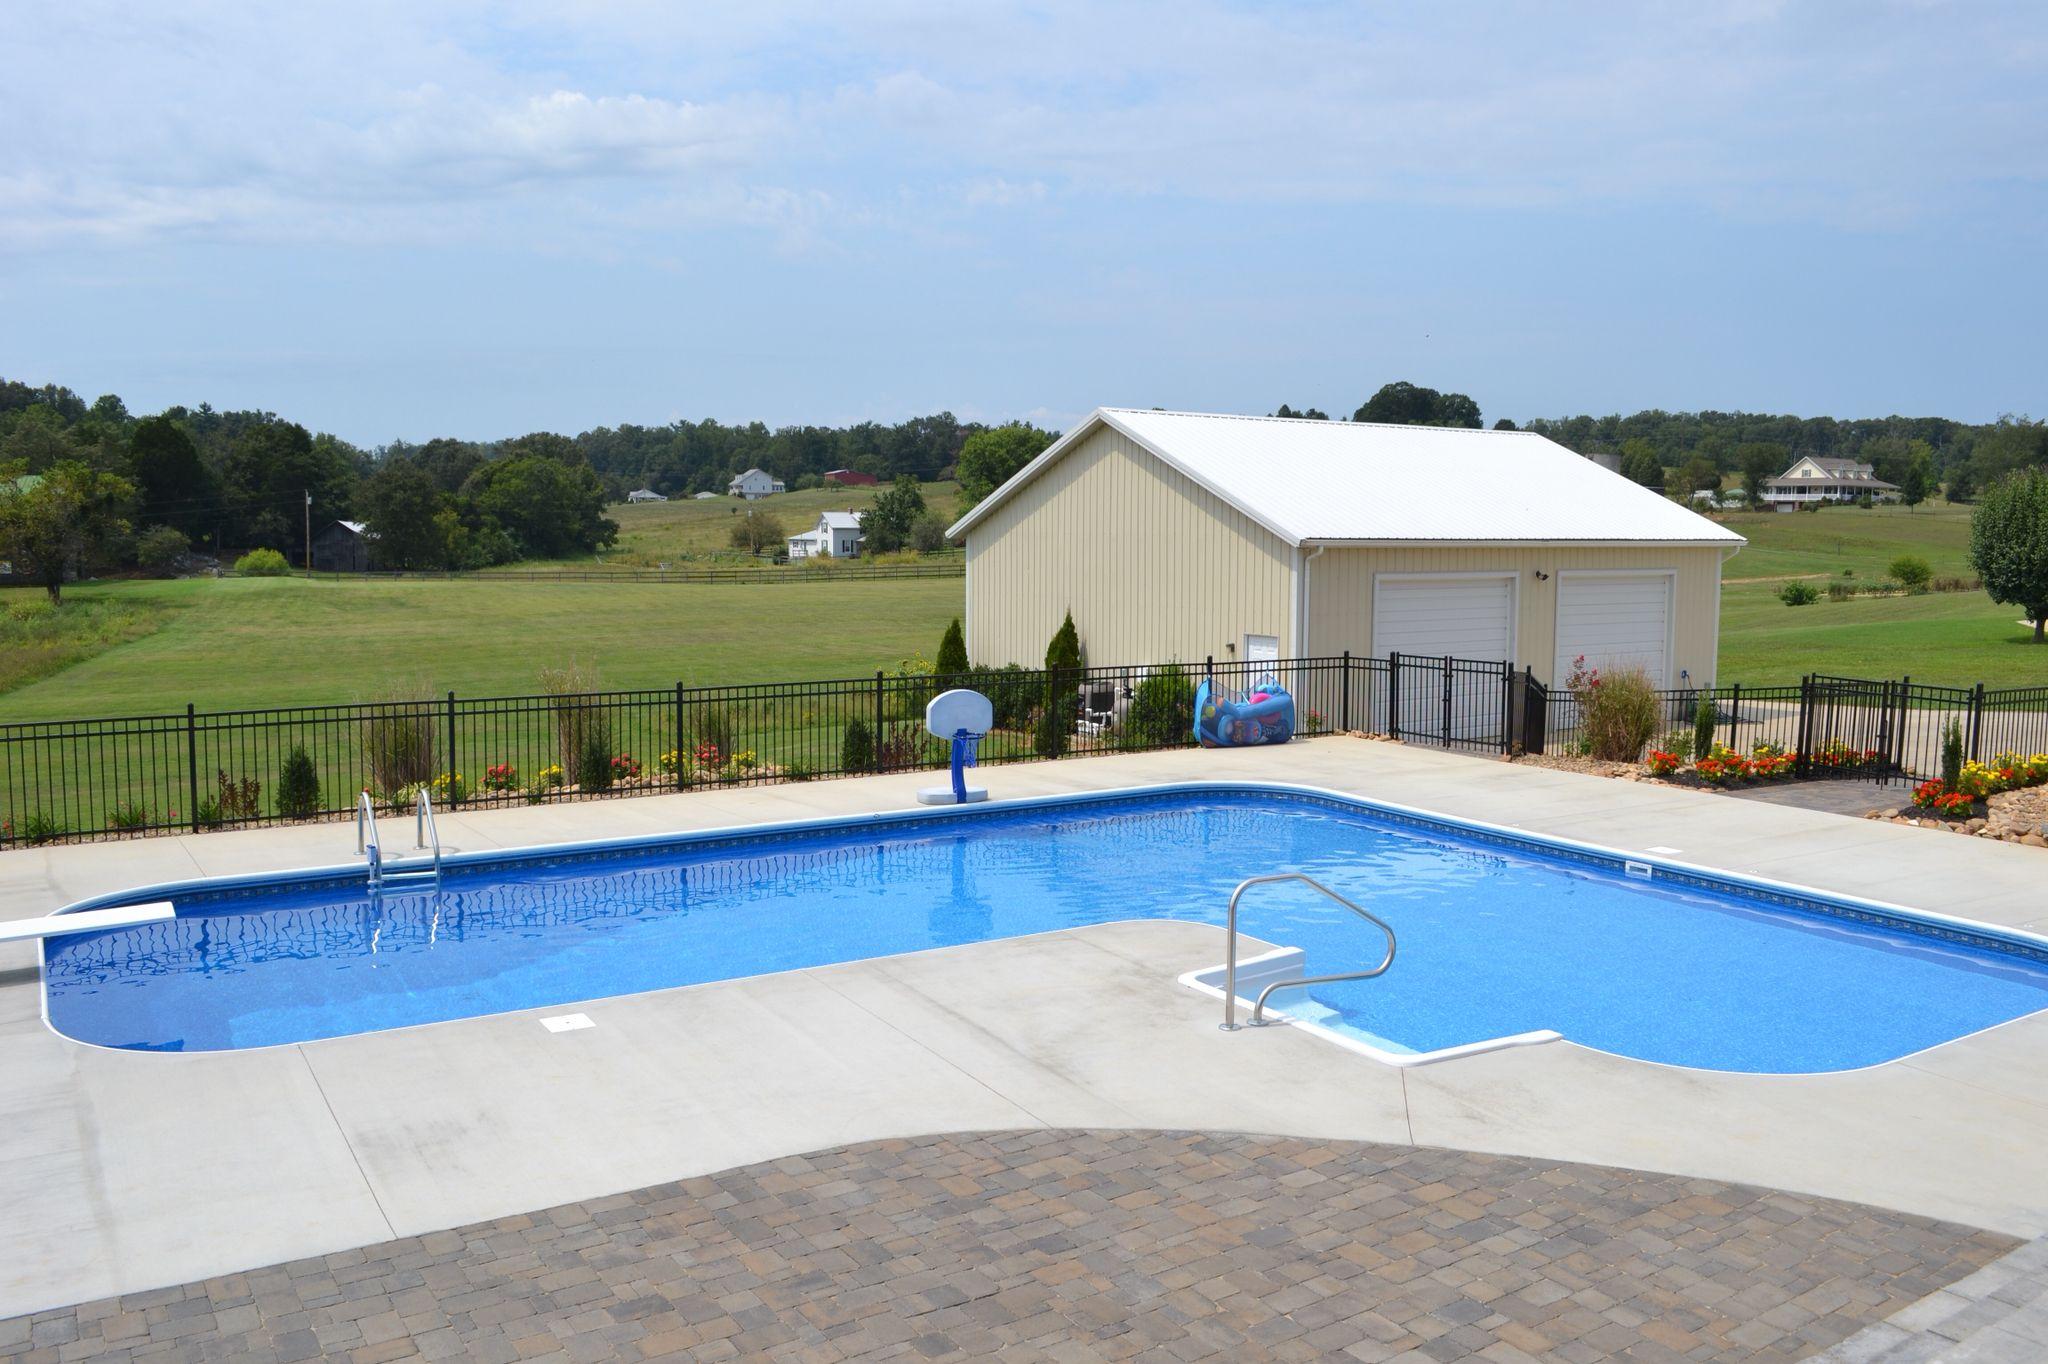 True L Shaped Vinyl Liner Pool By Brooks Malone Pool Houses Swimming Pools Backyard Swimming Pool Installation